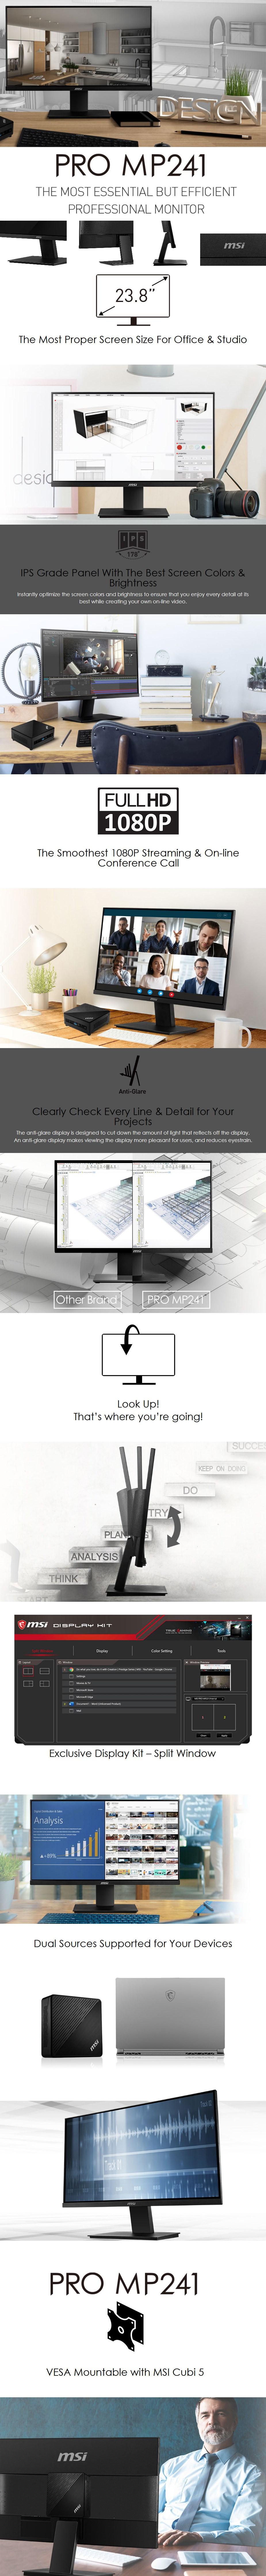 "MSI PRO MP241 23.8"" Full HD Anti-Glare IPS Monitor - Overview 1"